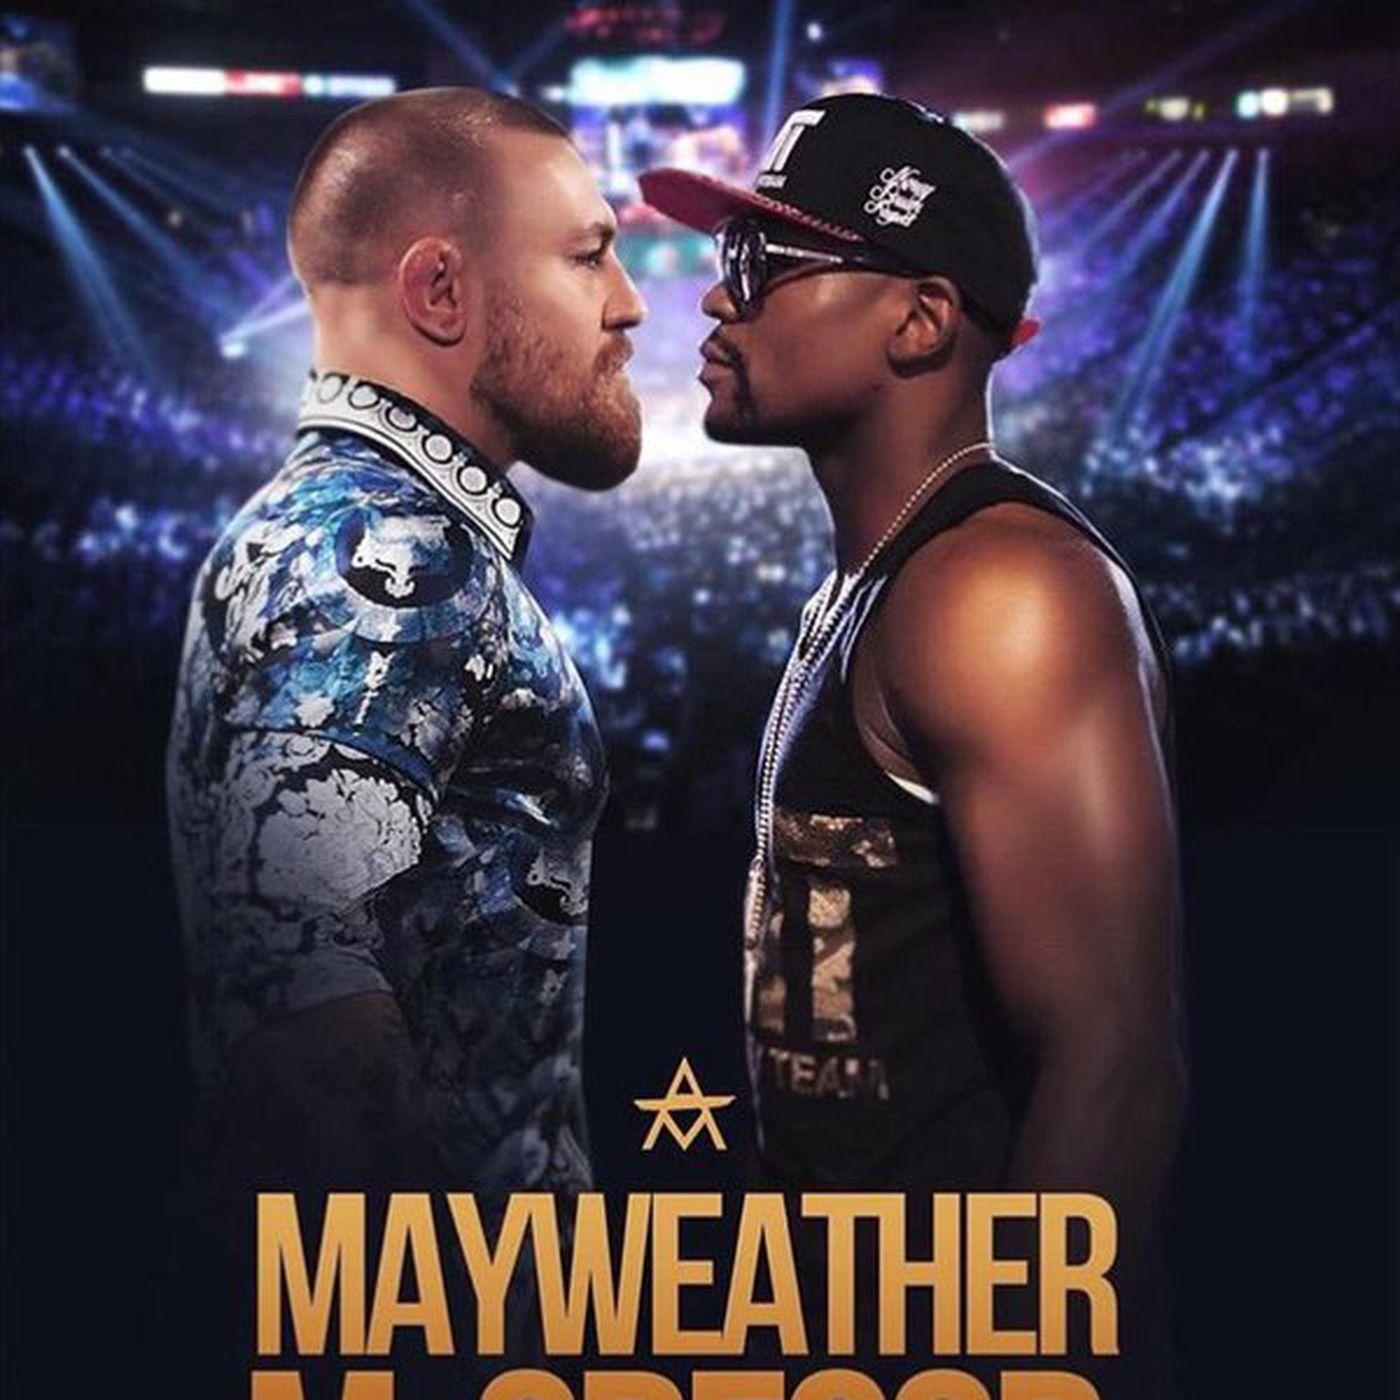 match conor mcgregor vs floyd mayweather date